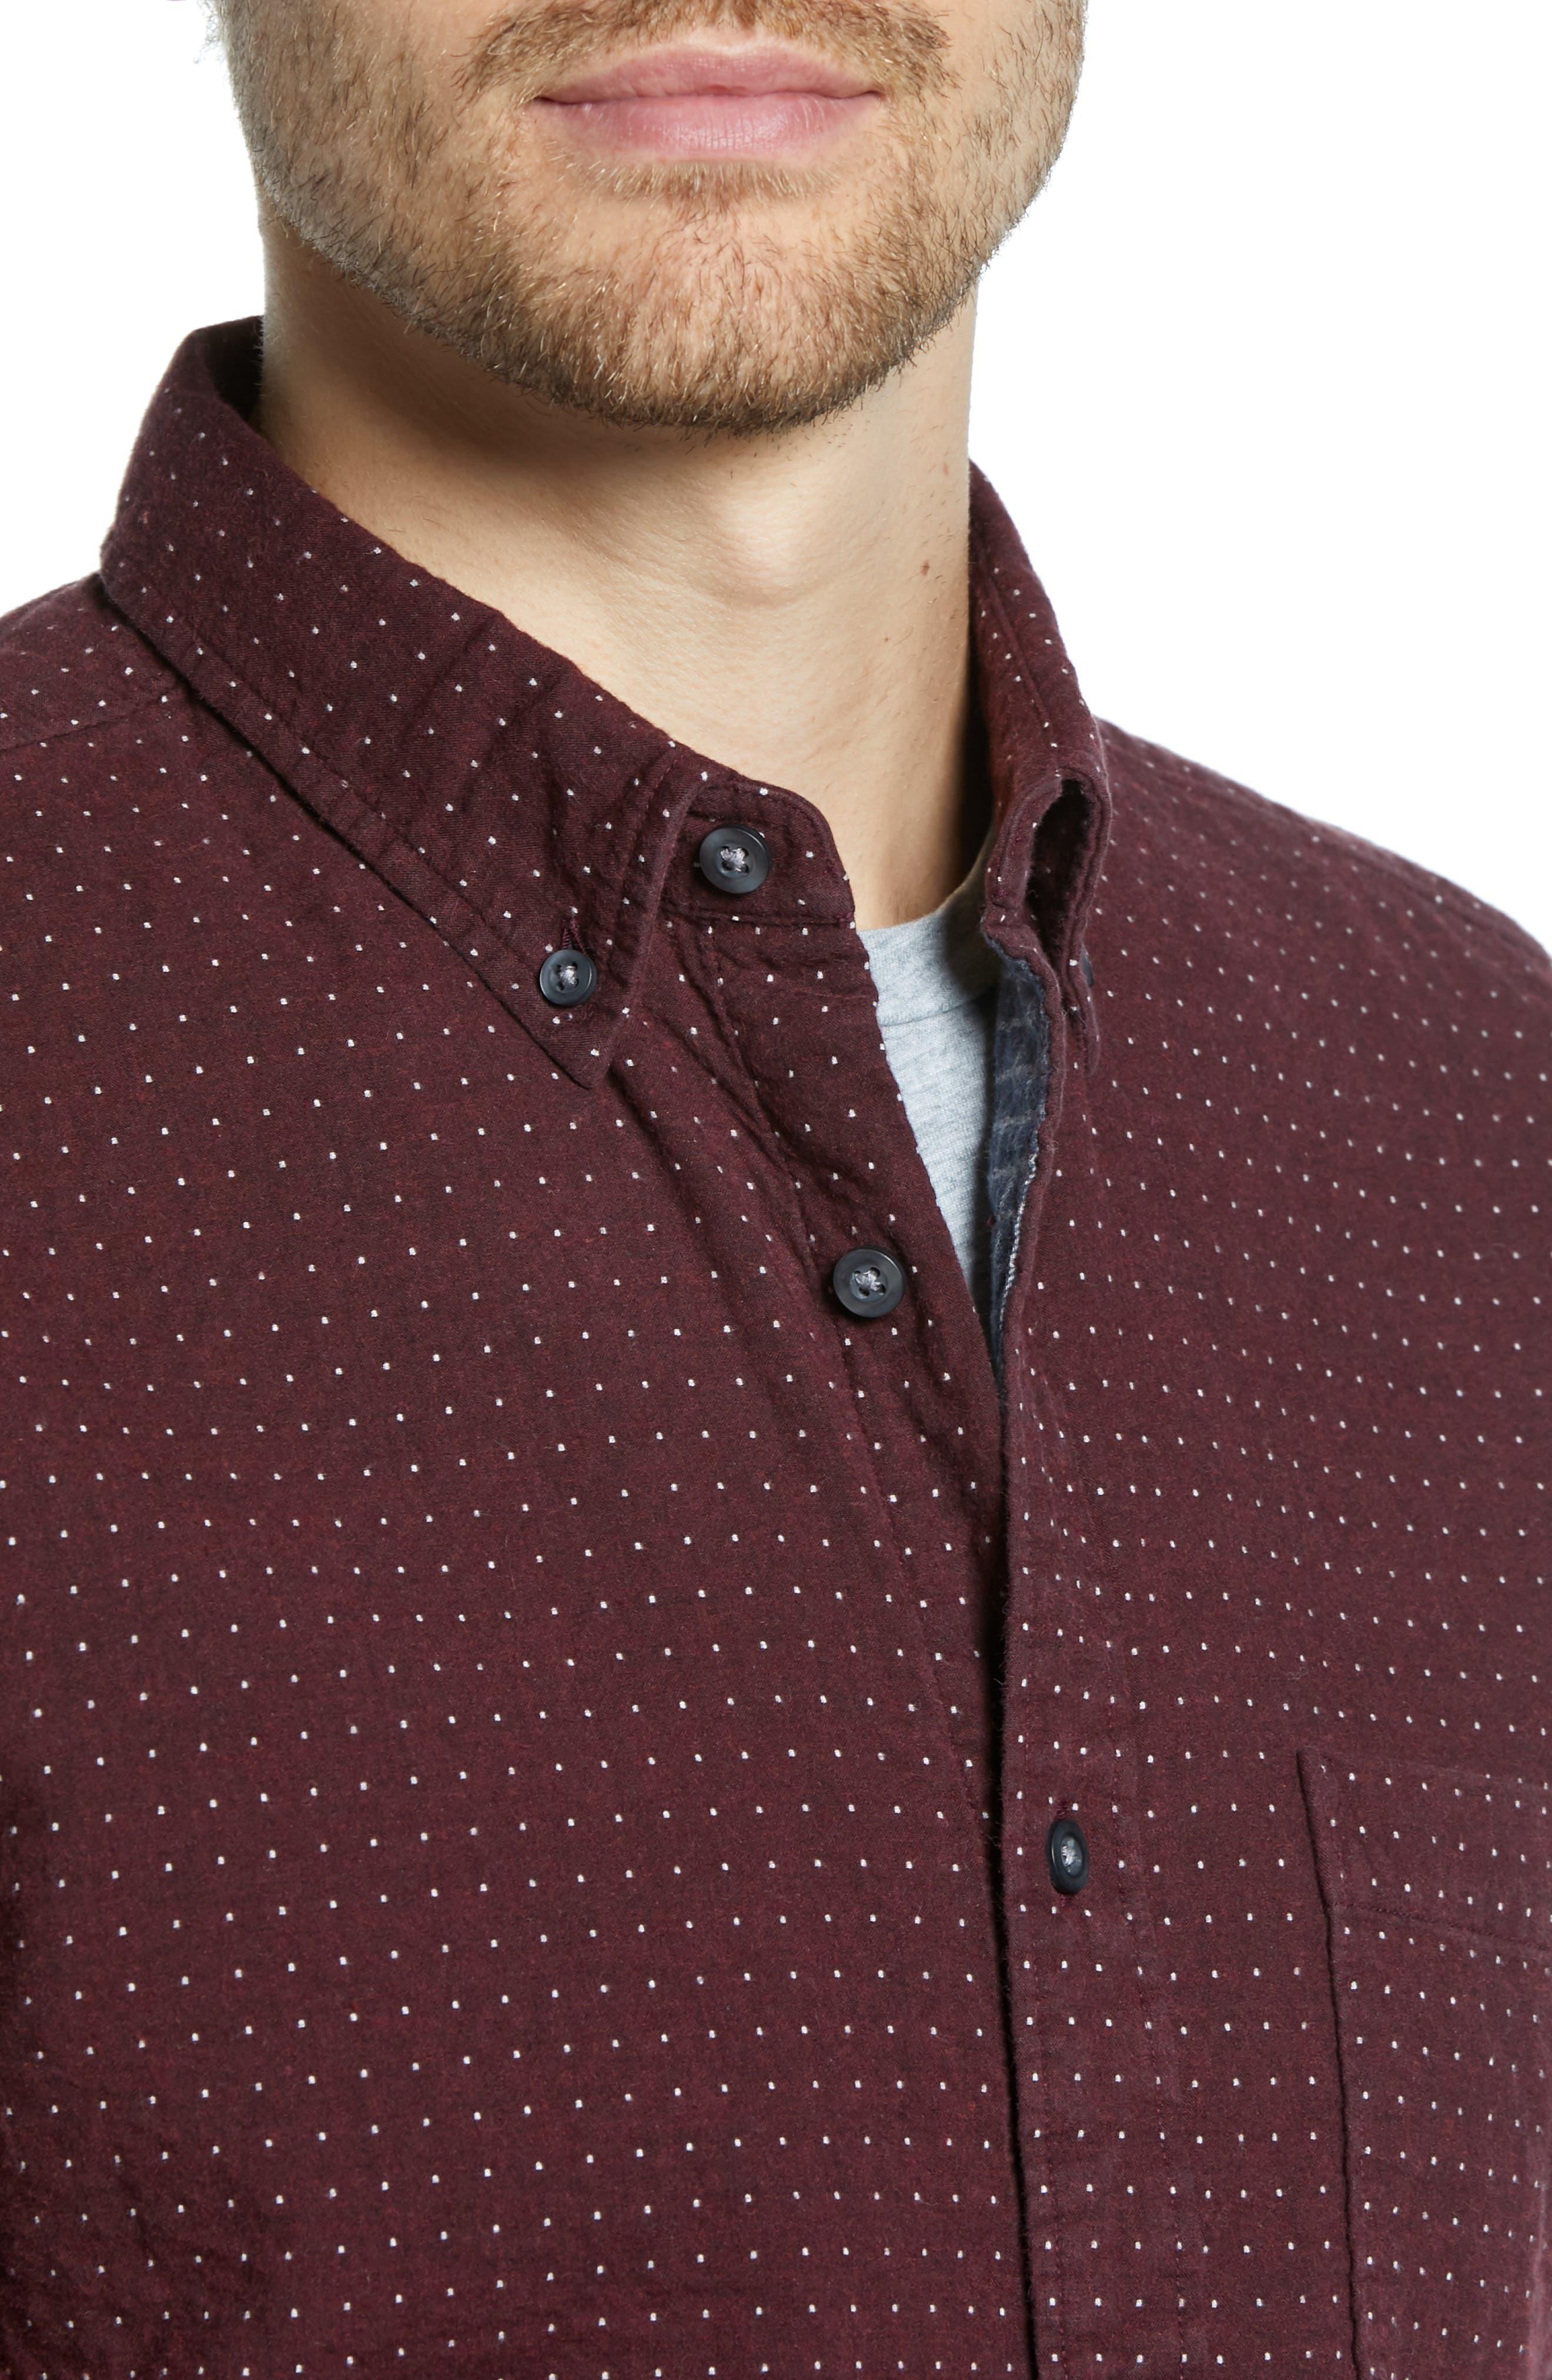 Trim Fit Dot Flannel Sport Shirt,                             Alternate thumbnail 2, color,                             BURGUNDY ROYALE GREY DUOFOLD